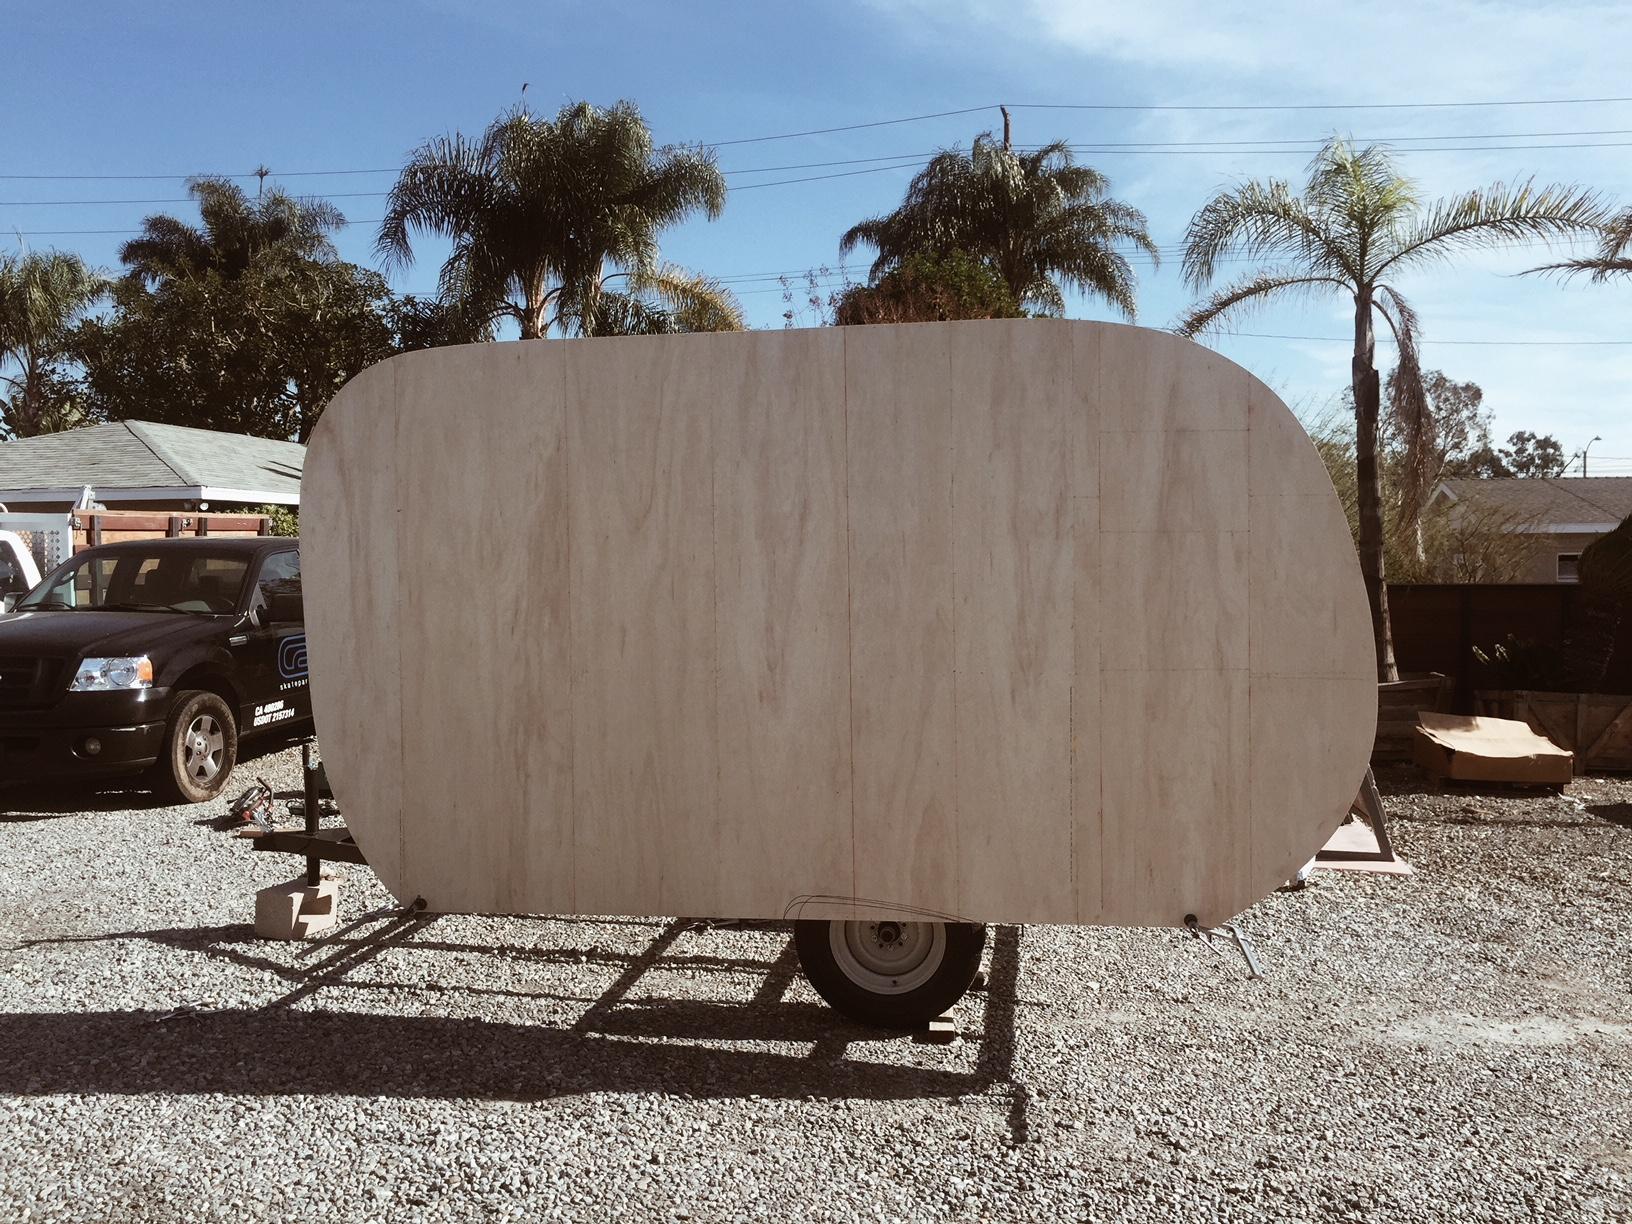 vintage-camper-build2.JPG